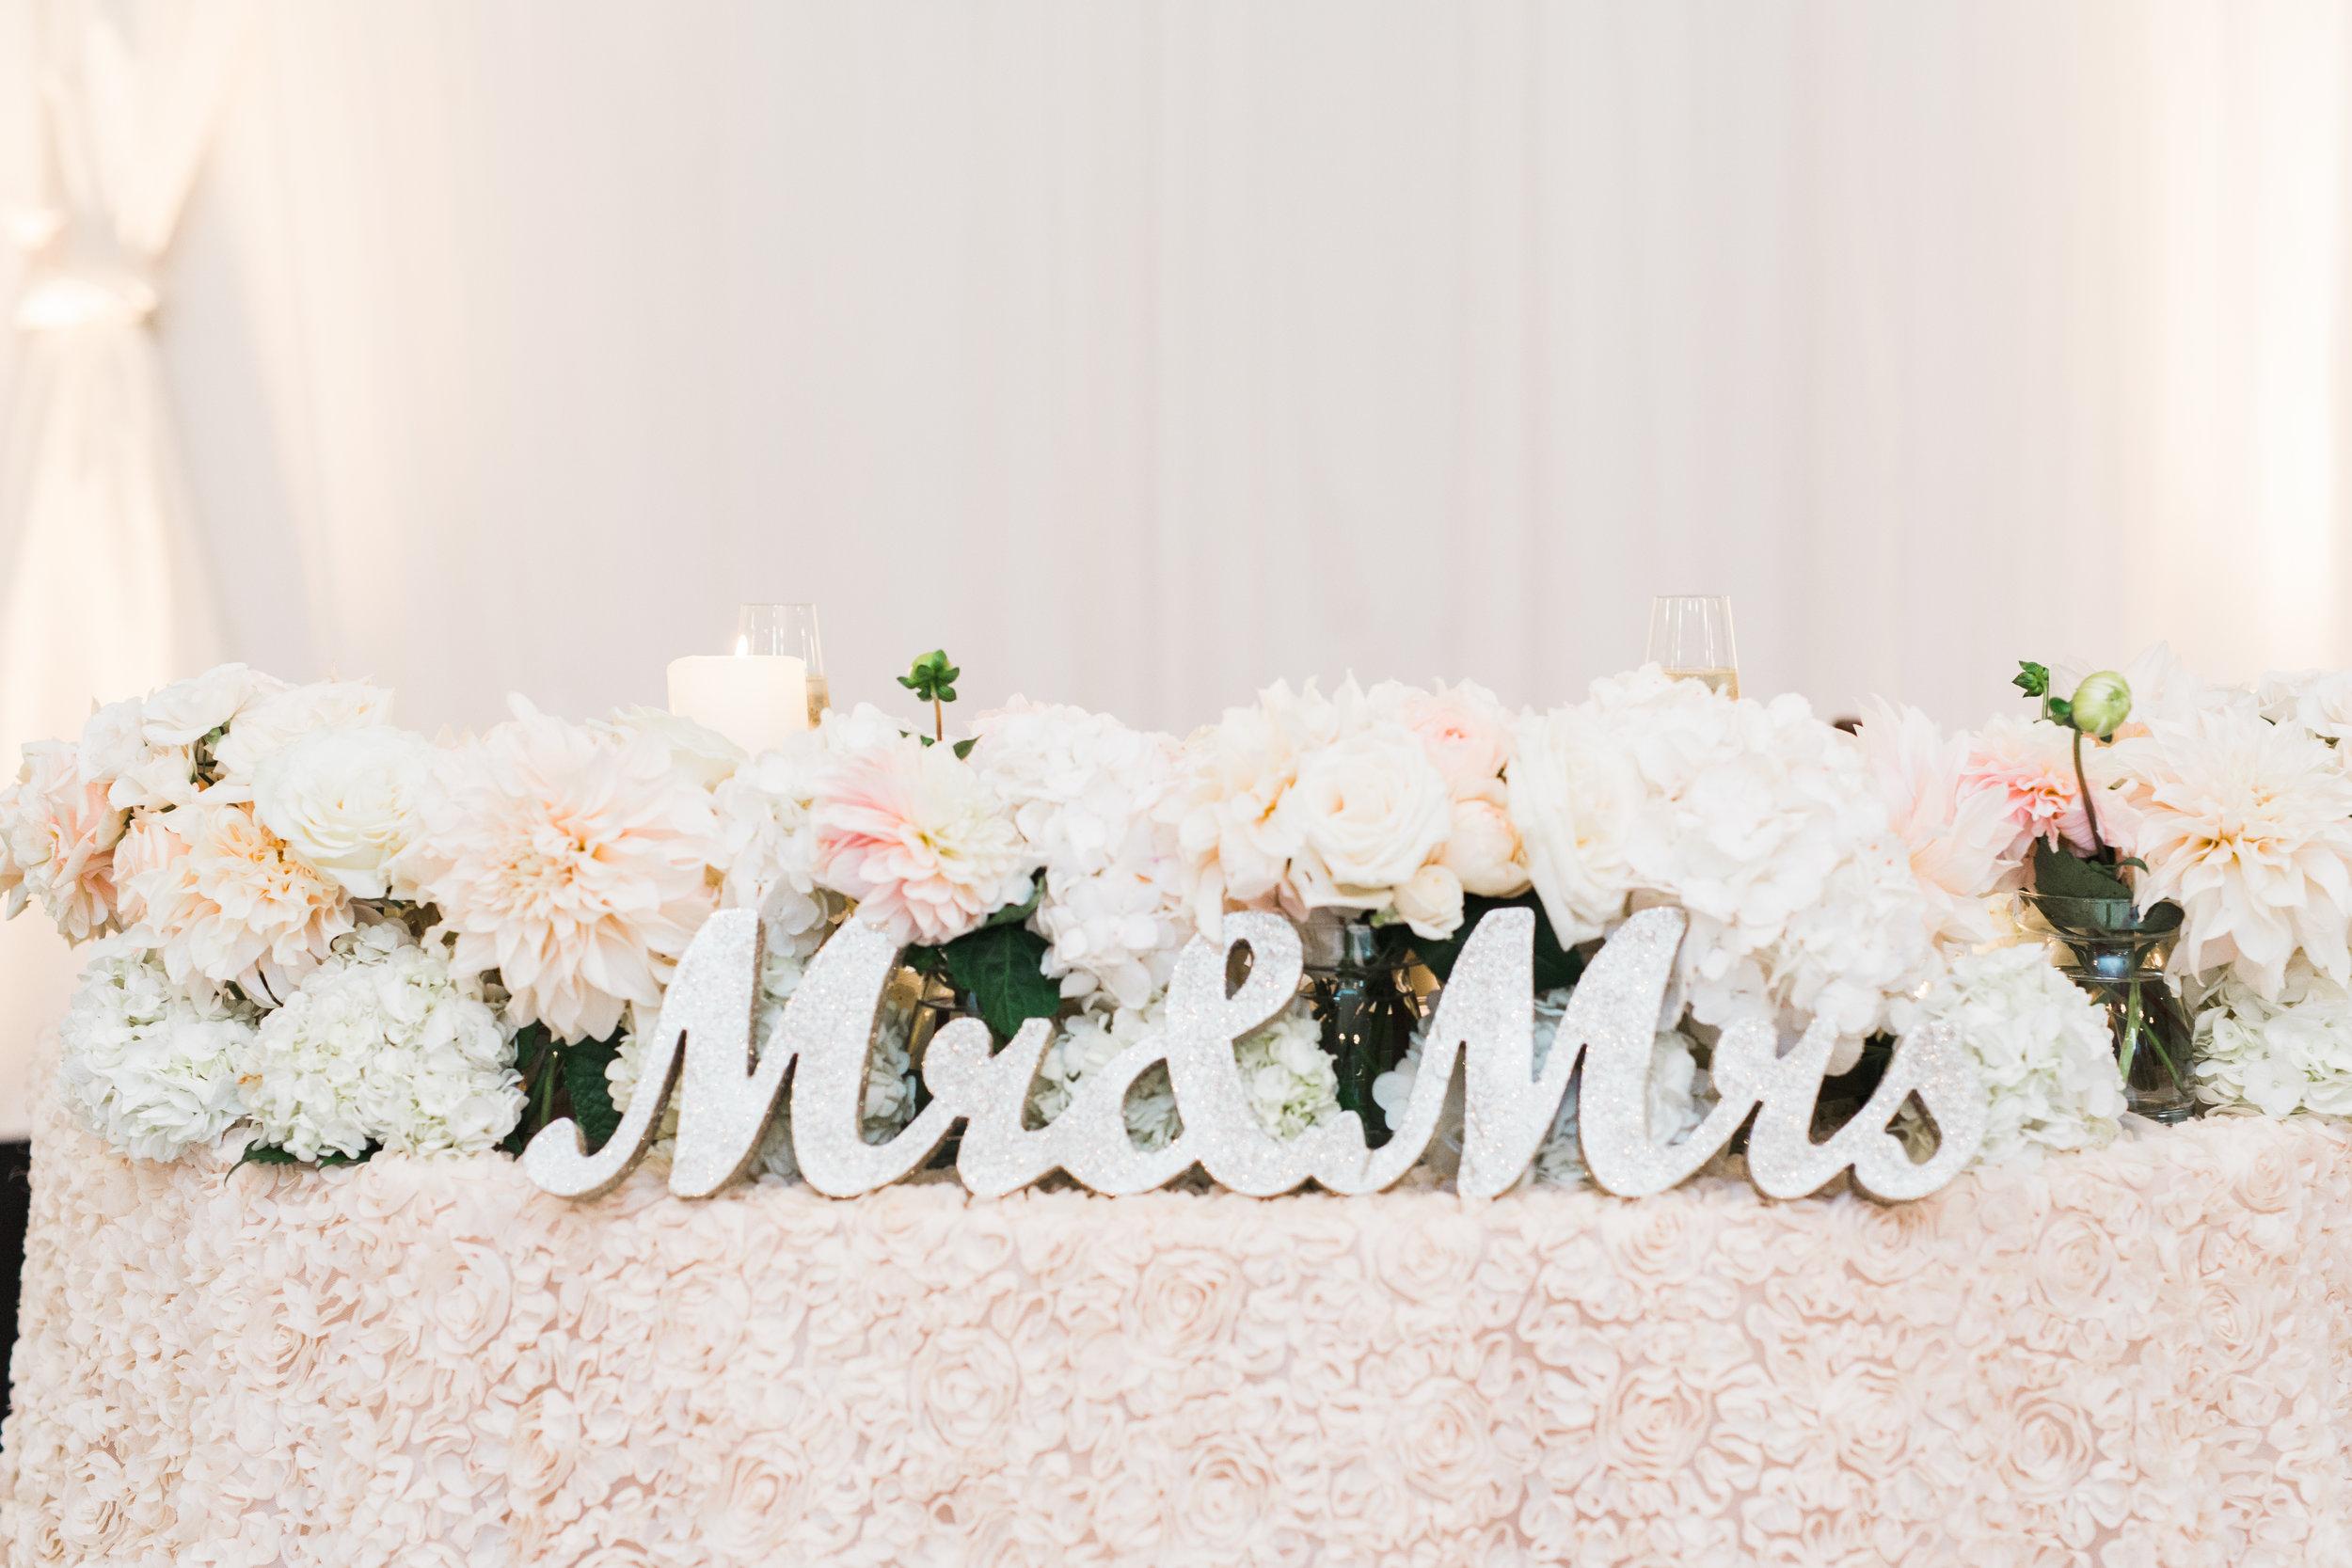 jenny-and-george-wedding-roque-events-meyerott-photography 1138.jpg